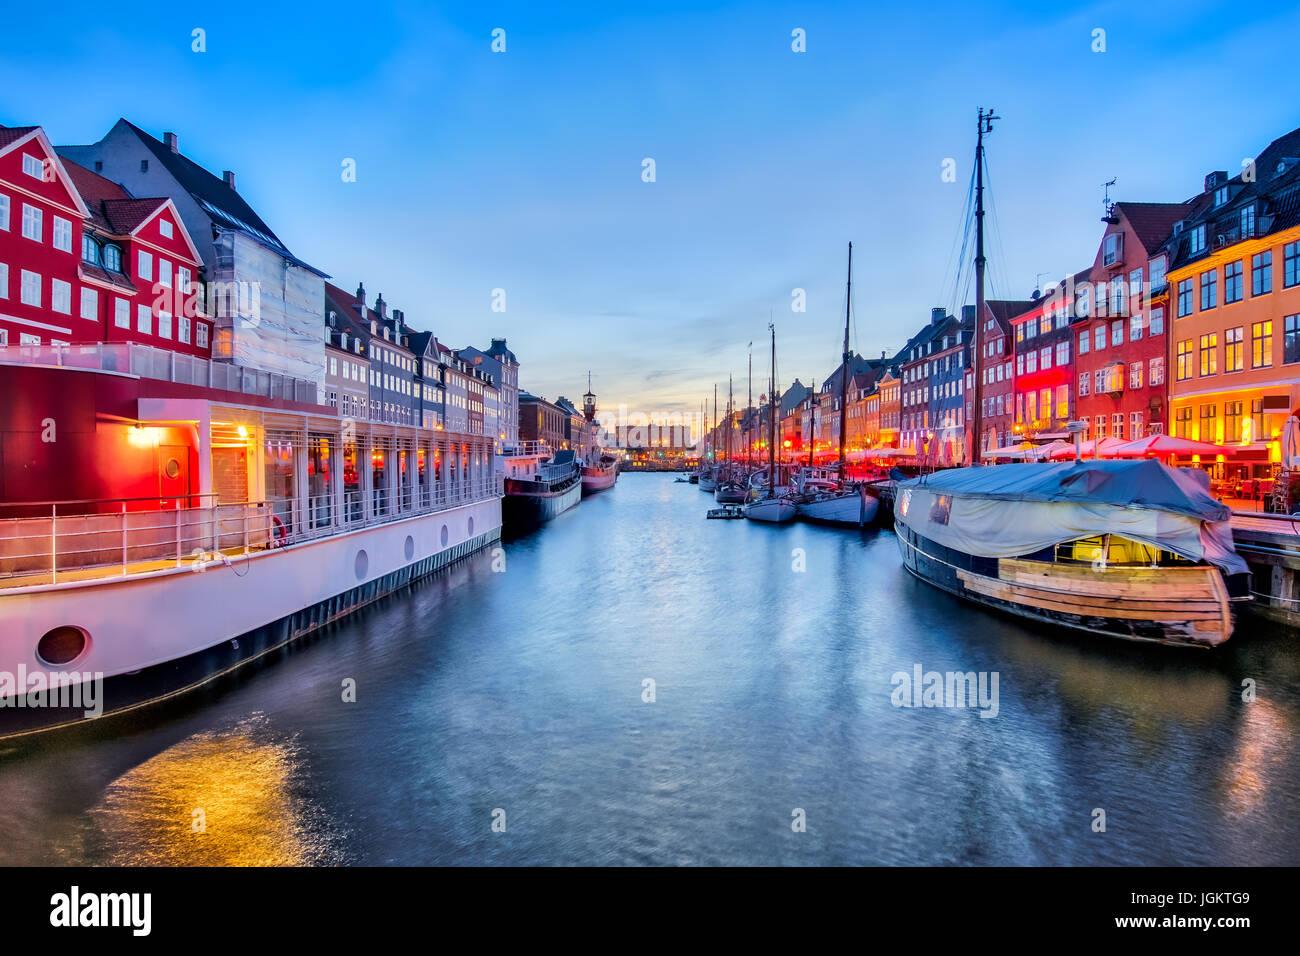 Nyhavn con coloridas fachadas de casas antiguas en Copenhague, Dinamarca Foto de stock